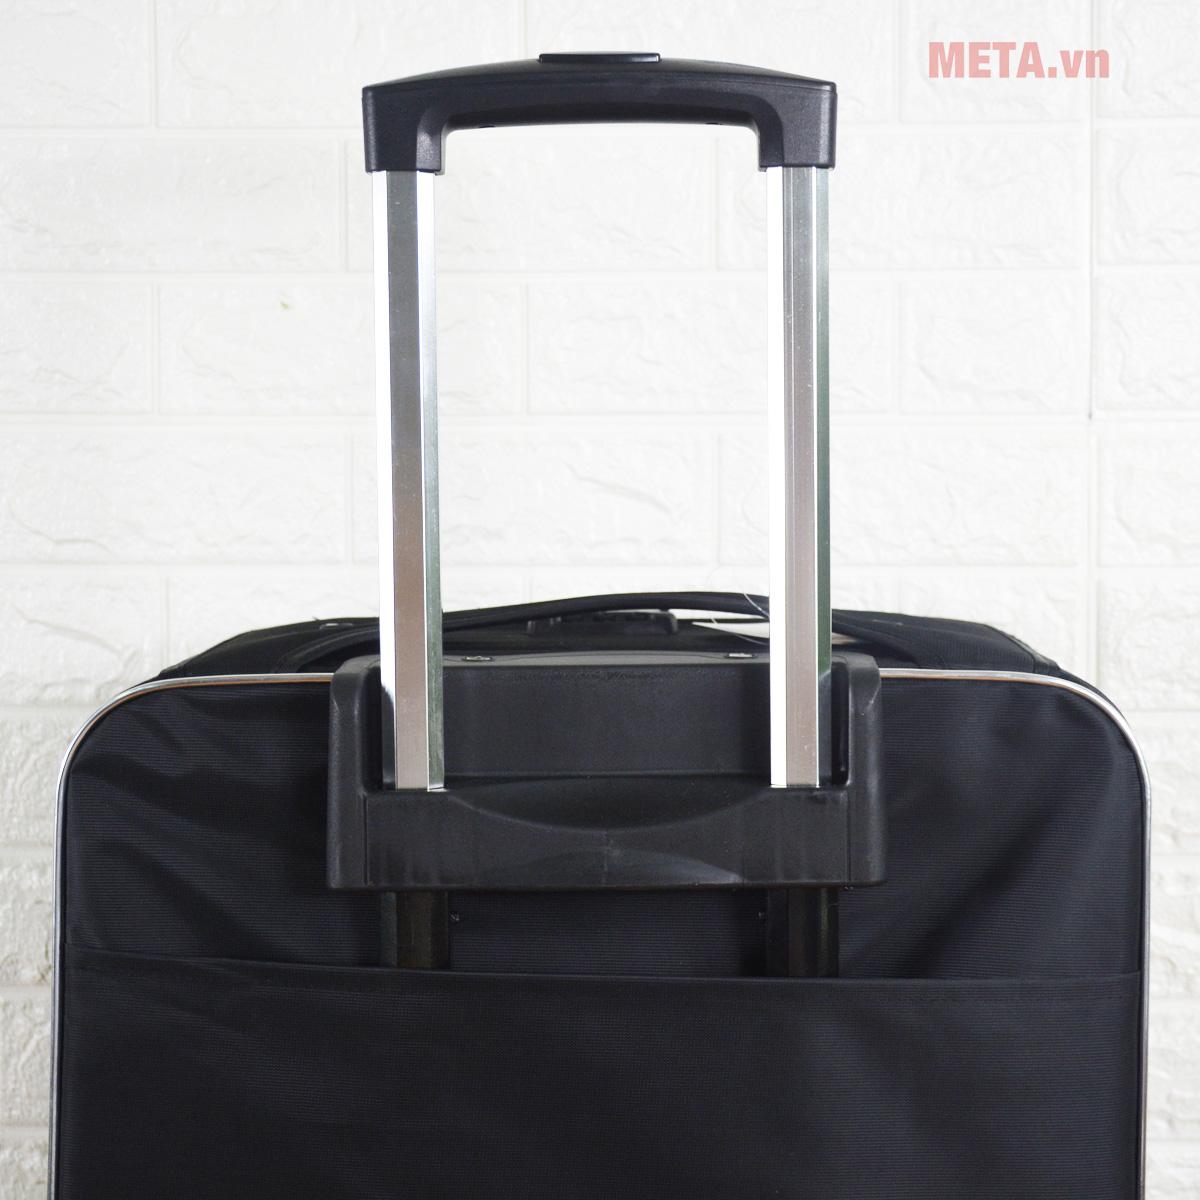 Cần kéo vali